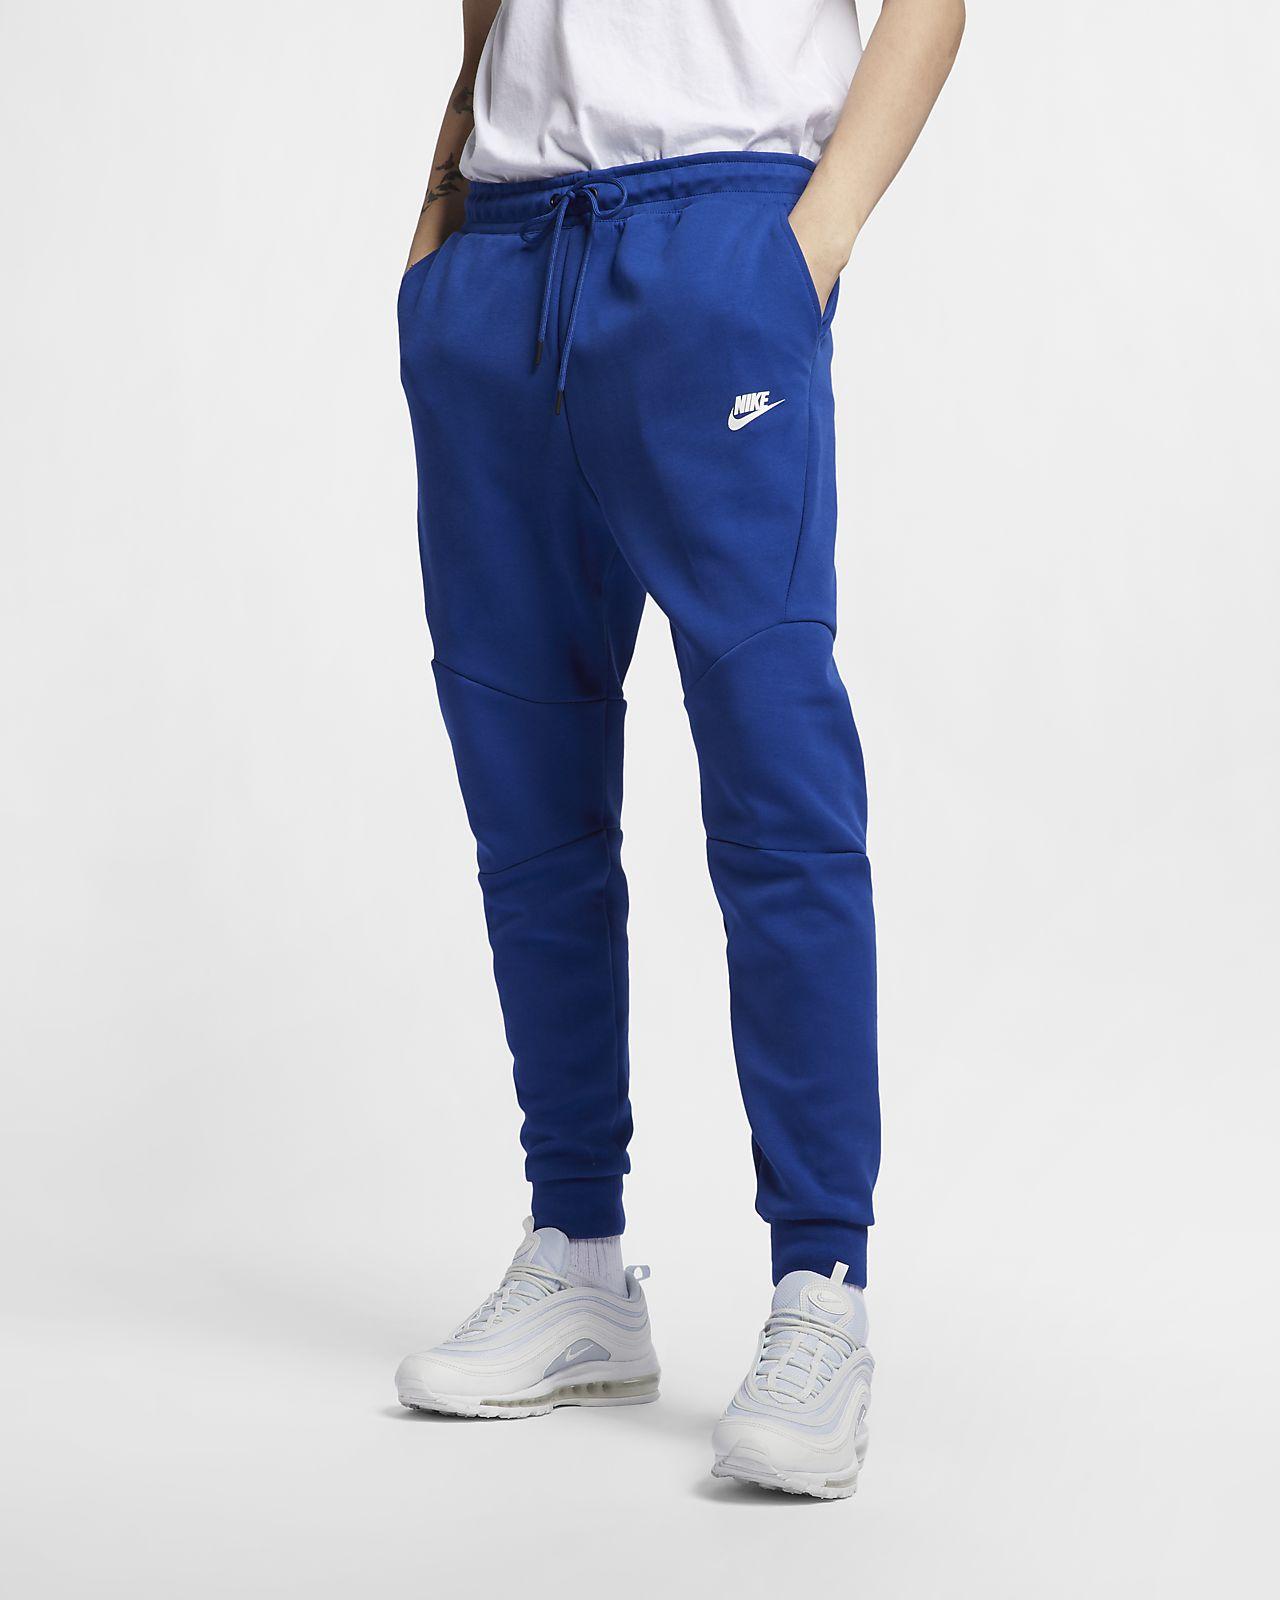 sale usa online well known cheap for sale Pantalon de jogging Nike Sportswear Tech Fleece pour Homme